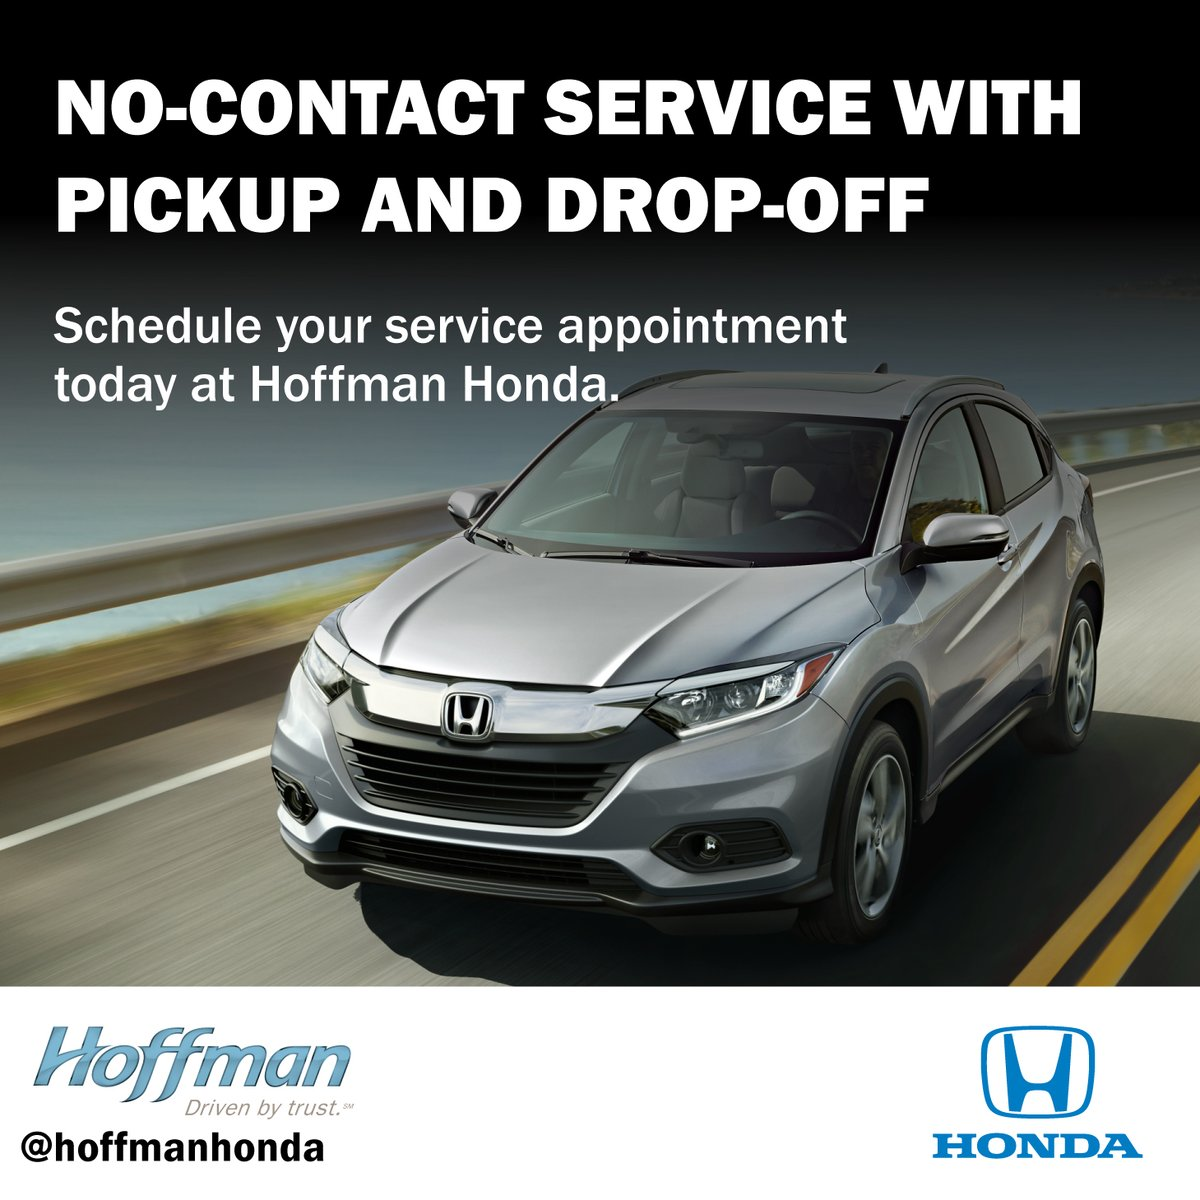 Hoffman Honda Hoffmanhonda Twitter